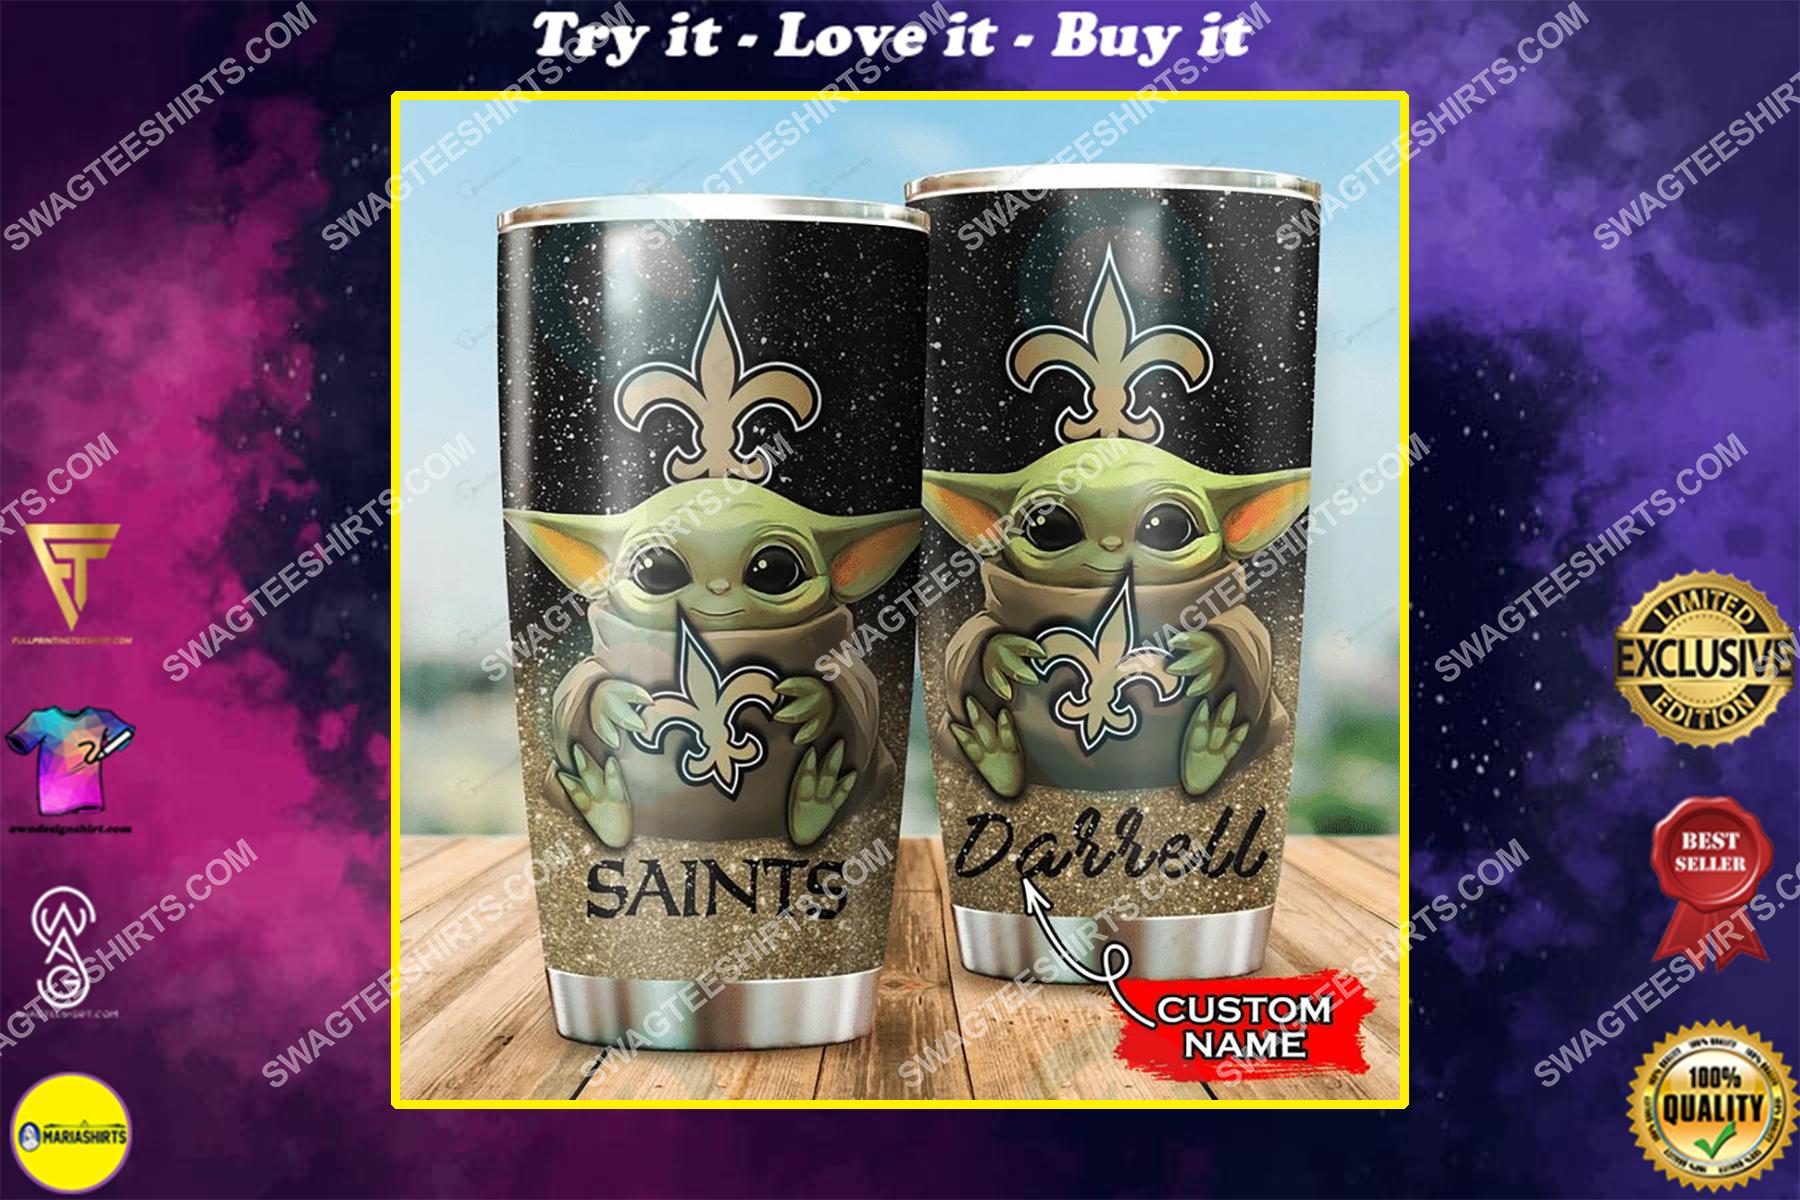 custom name baby yoda and new orleans saints full printing tumbler